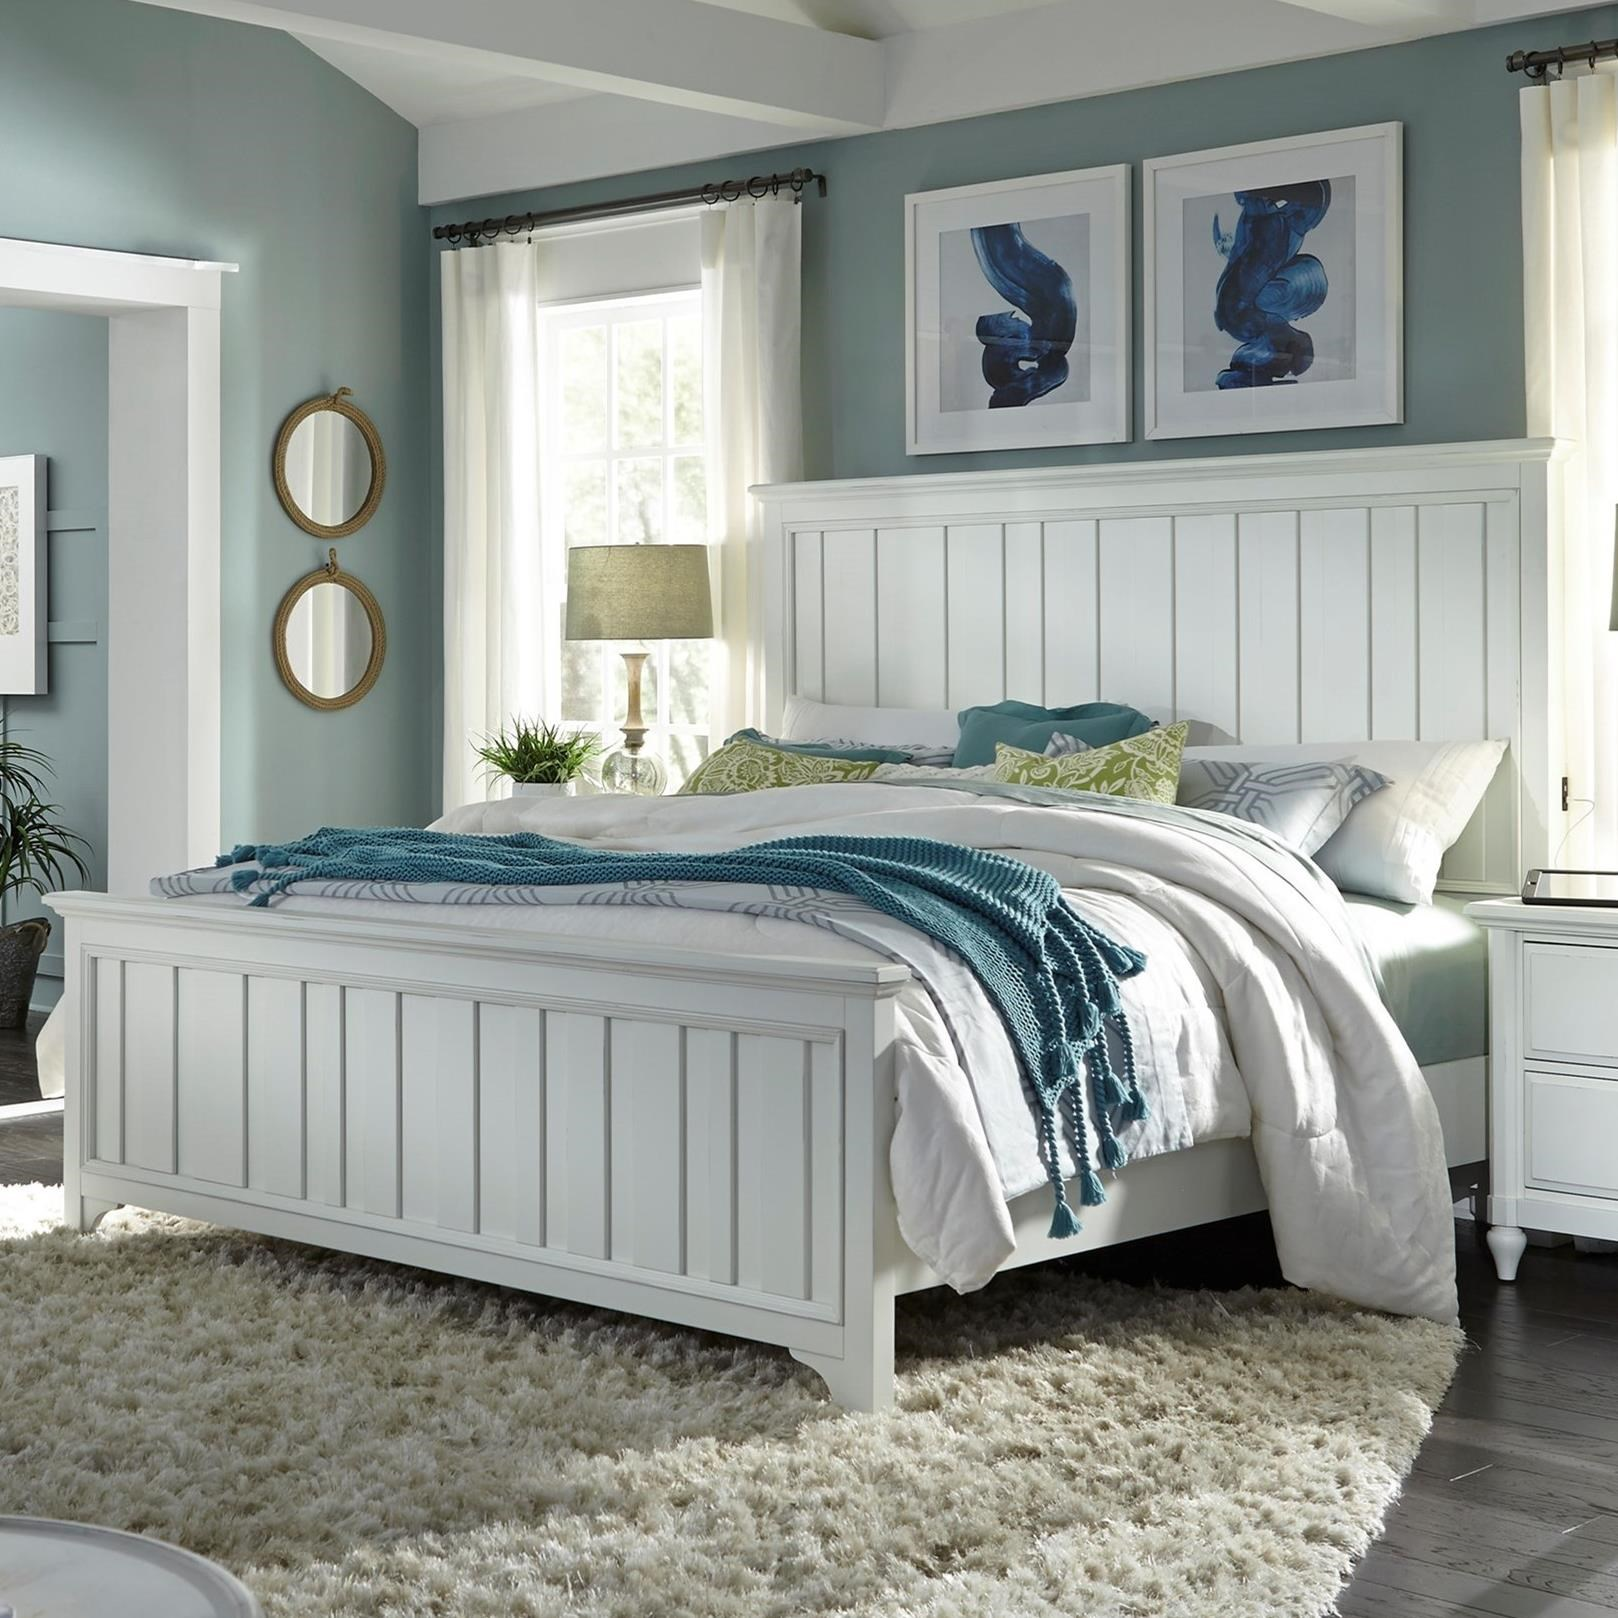 Retreat California King Farmhouse Panel Bed by Aspenhome at Virginia Furniture Market